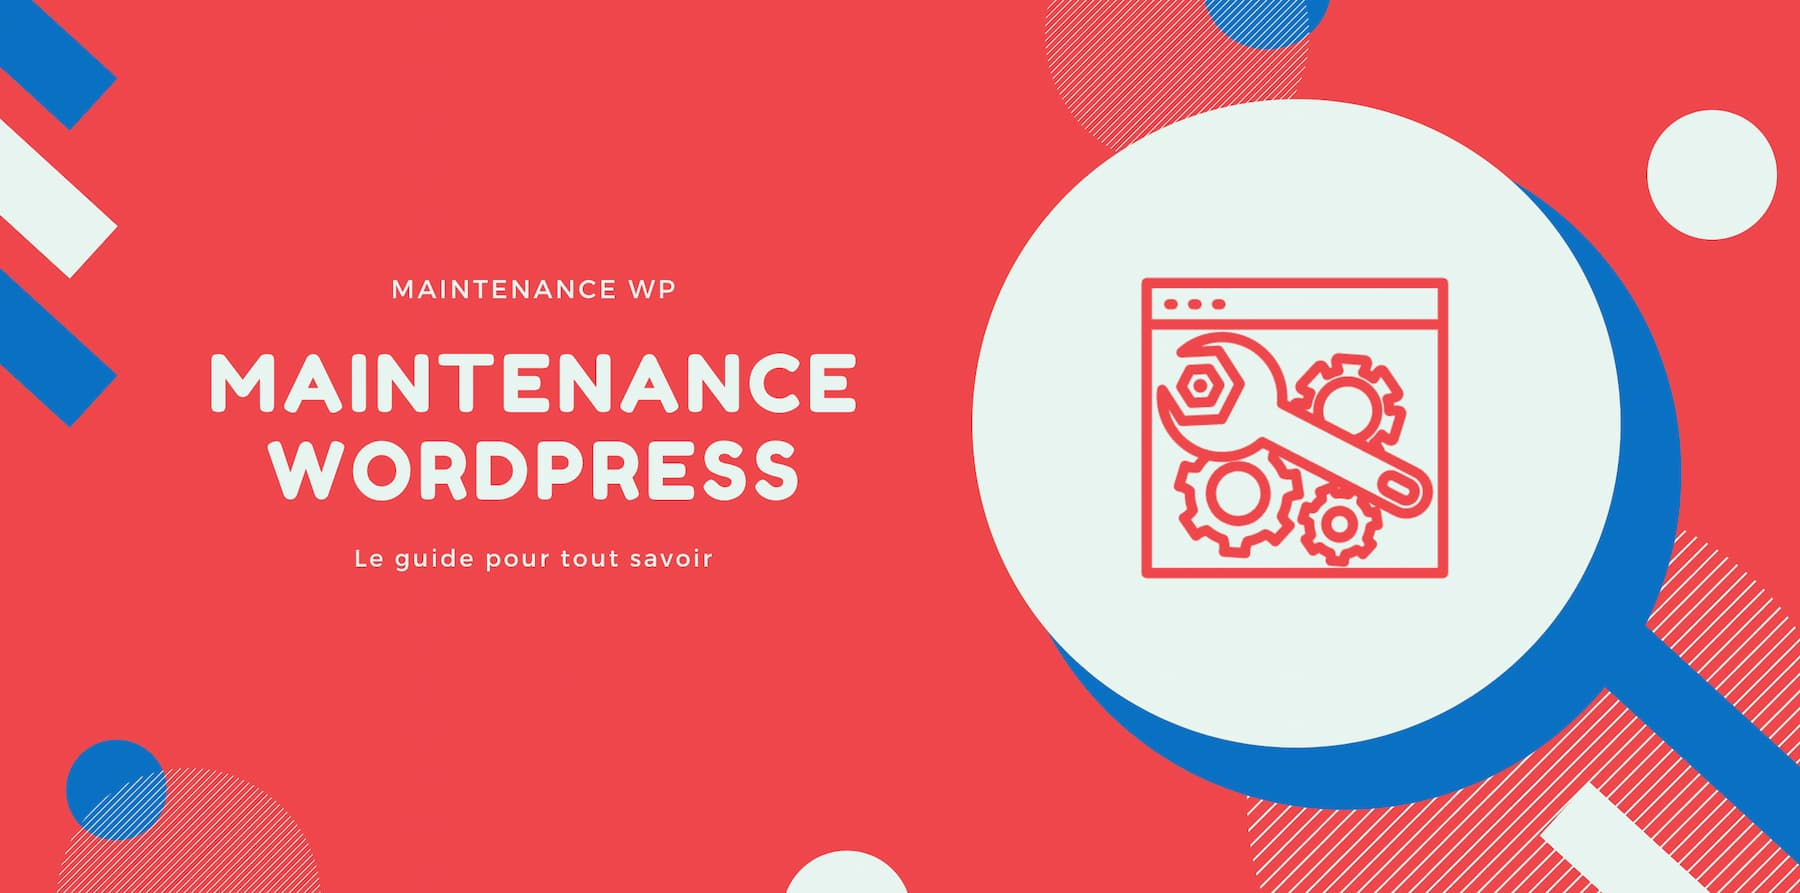 Le Guide de la maintenance WordPress